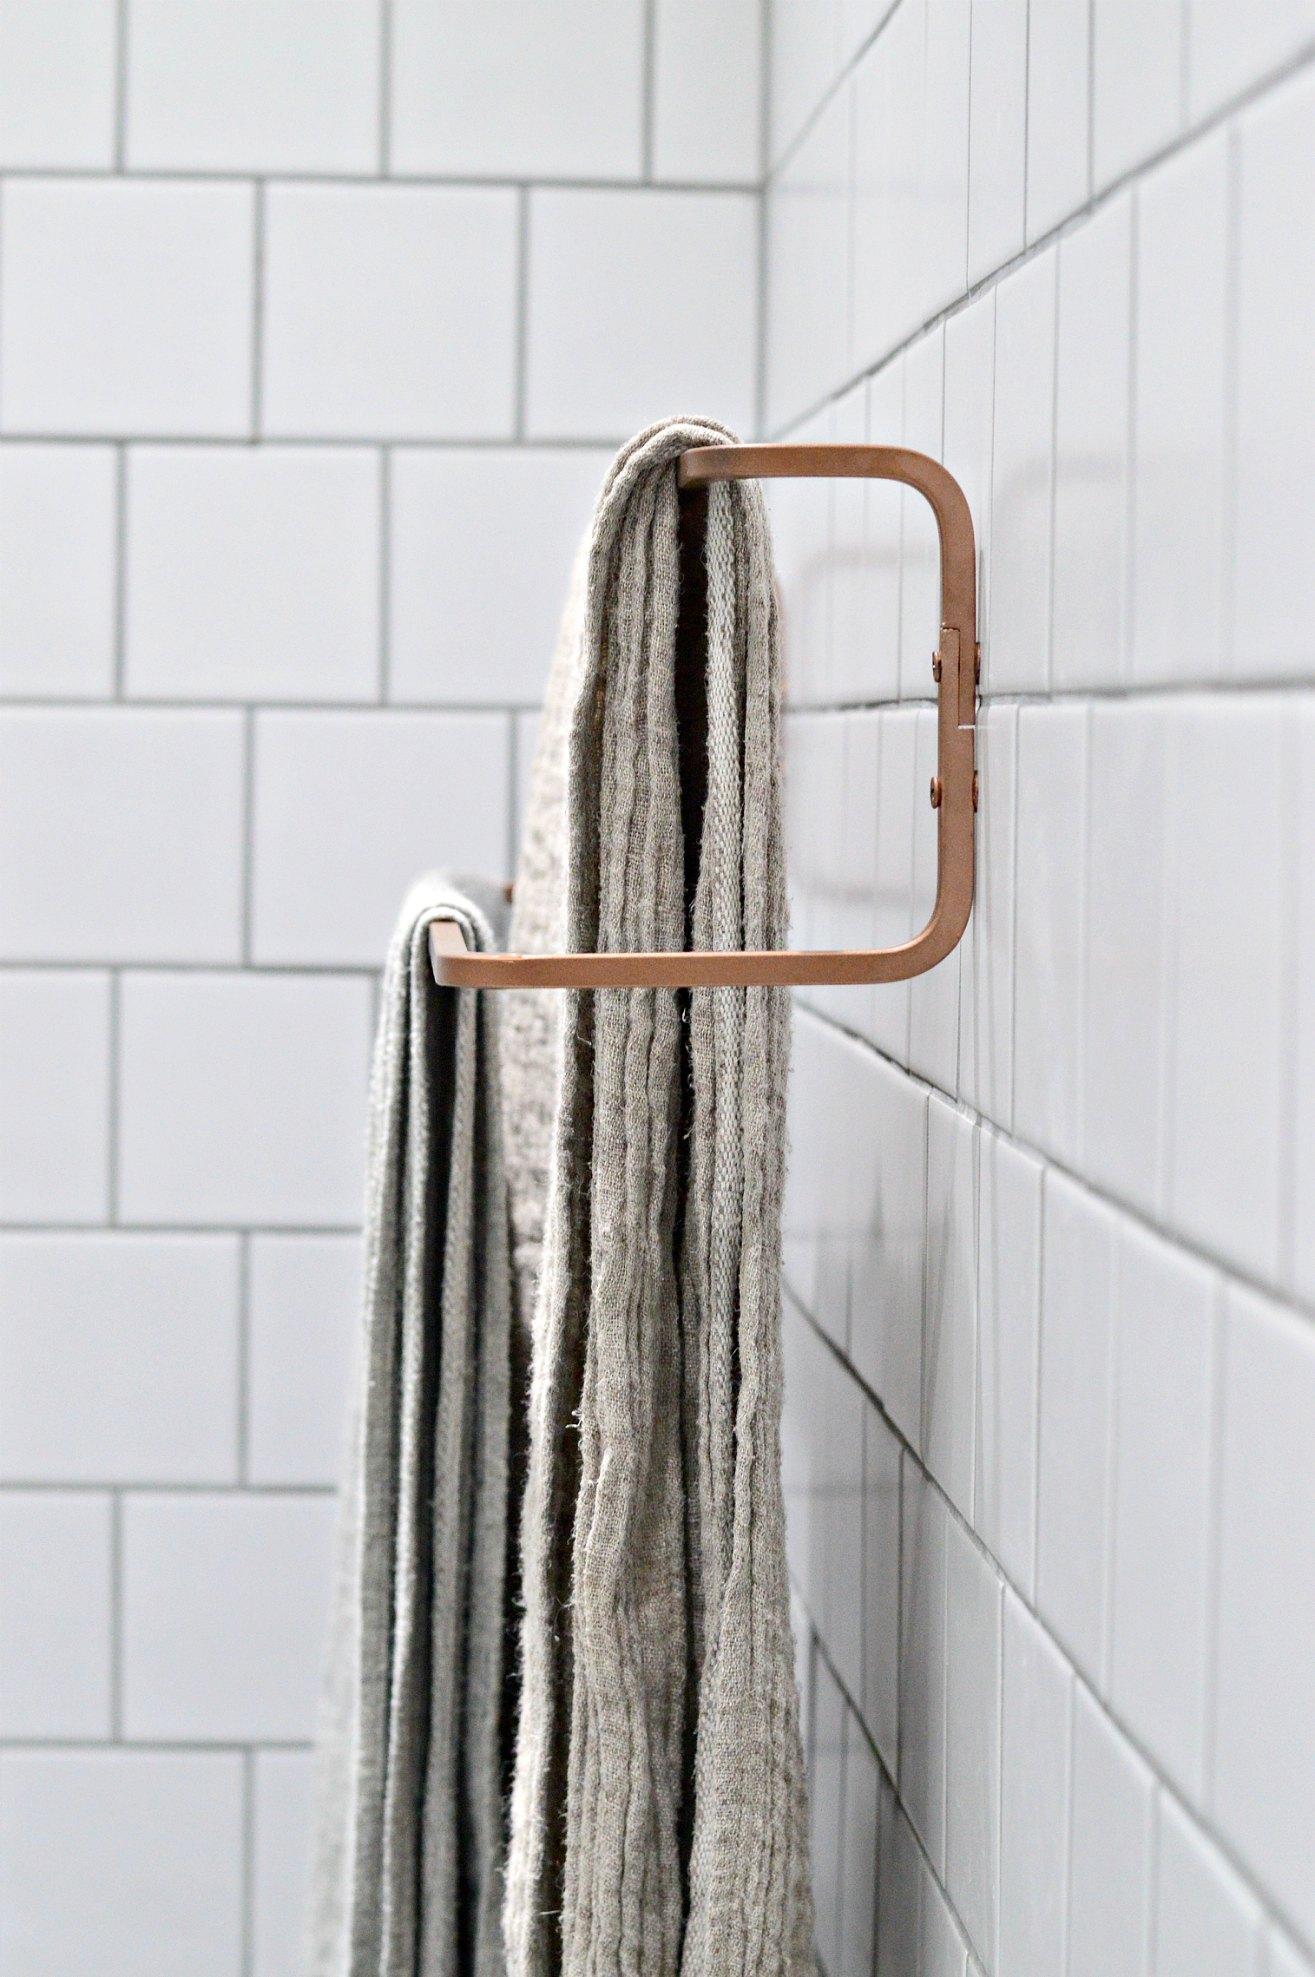 8 minute DIY: Ikea towel rail hack - DIY home decor - Your DIY Family